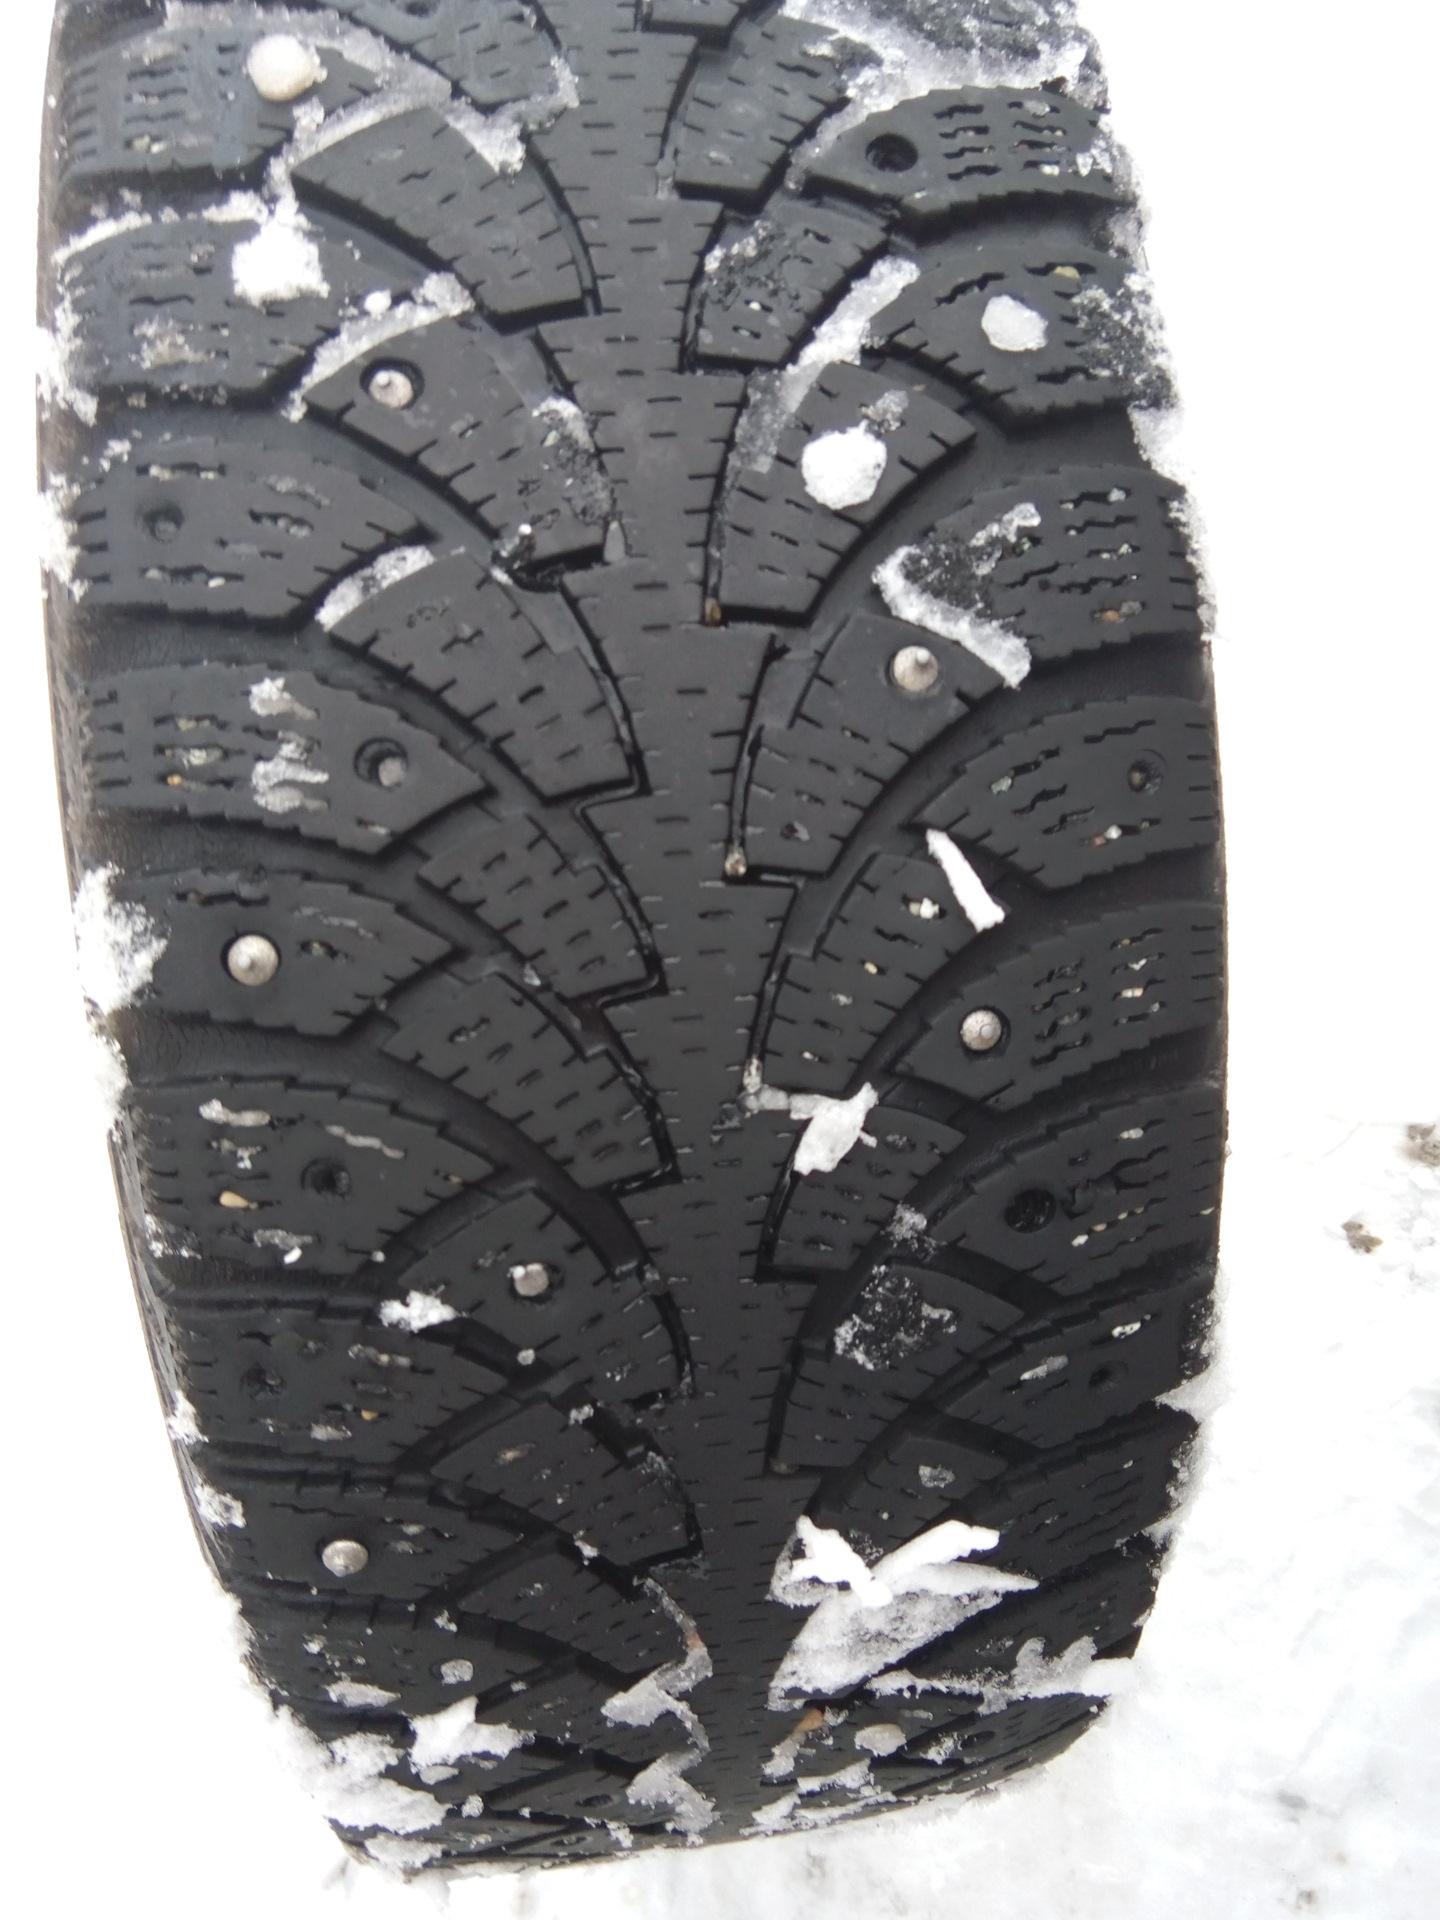 Дошиповка зимних шин своими руками фото 698